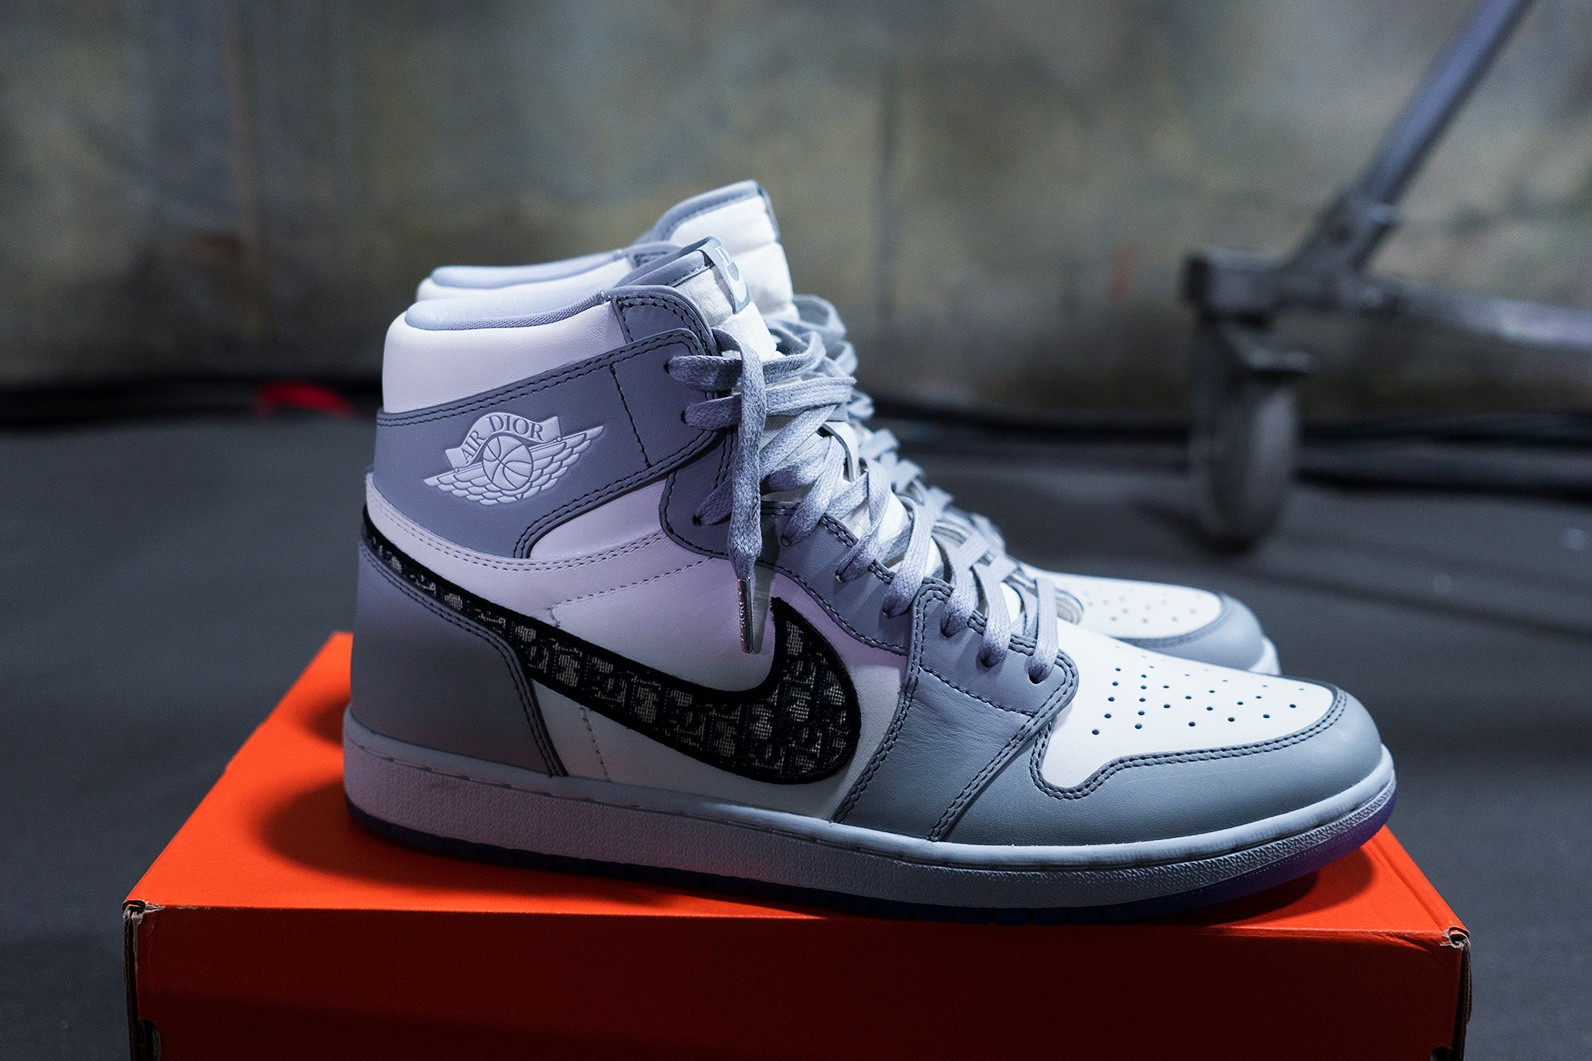 Dior x Air Jordan 1 High OG Pre-Fall